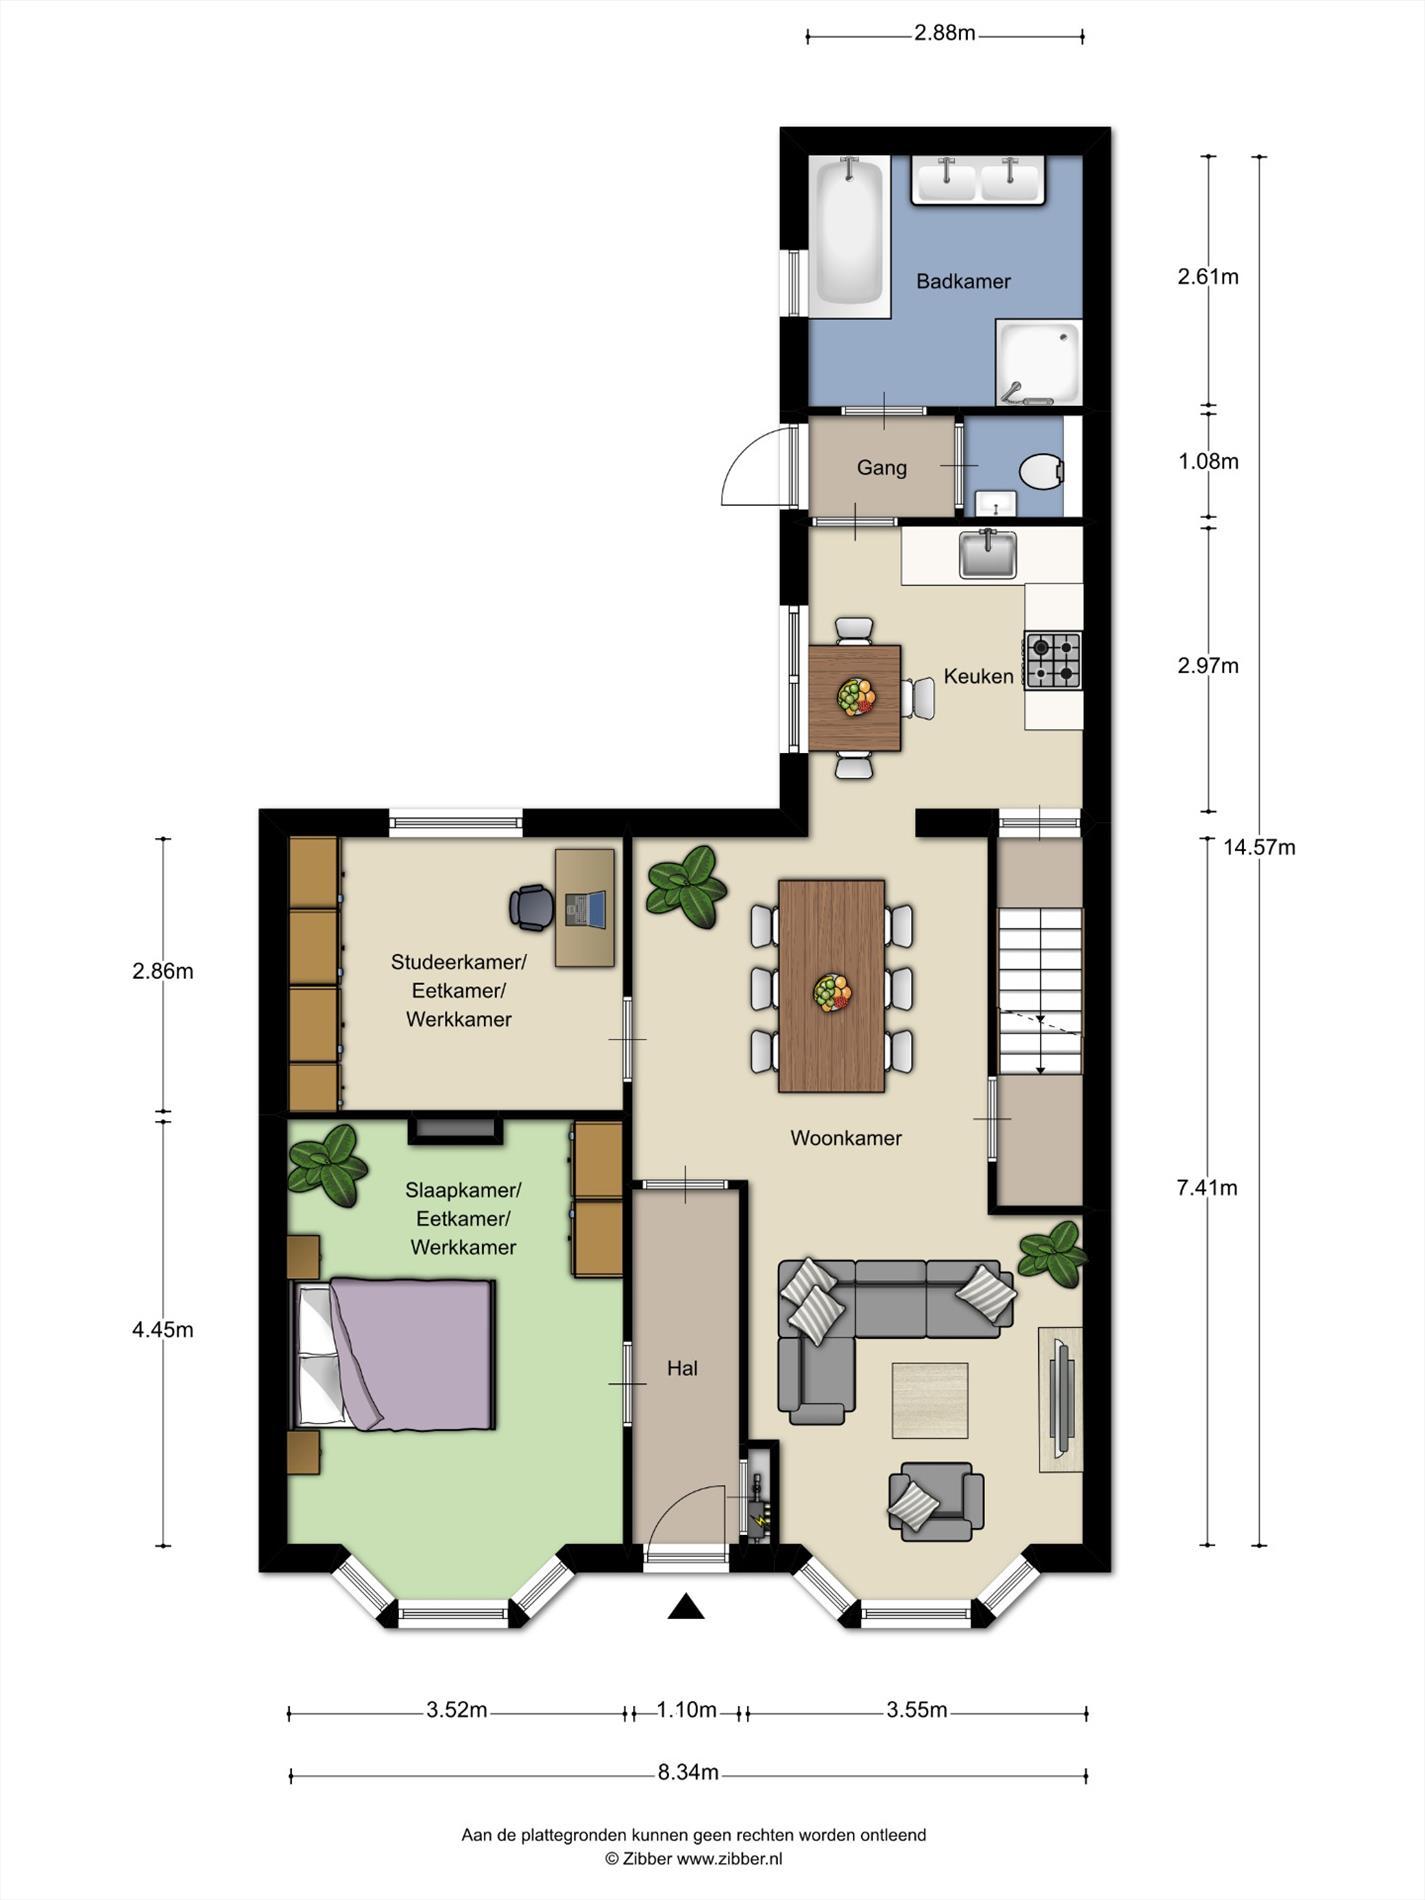 Floorplan - Marktstraat 73, 5731 HV Mierlo